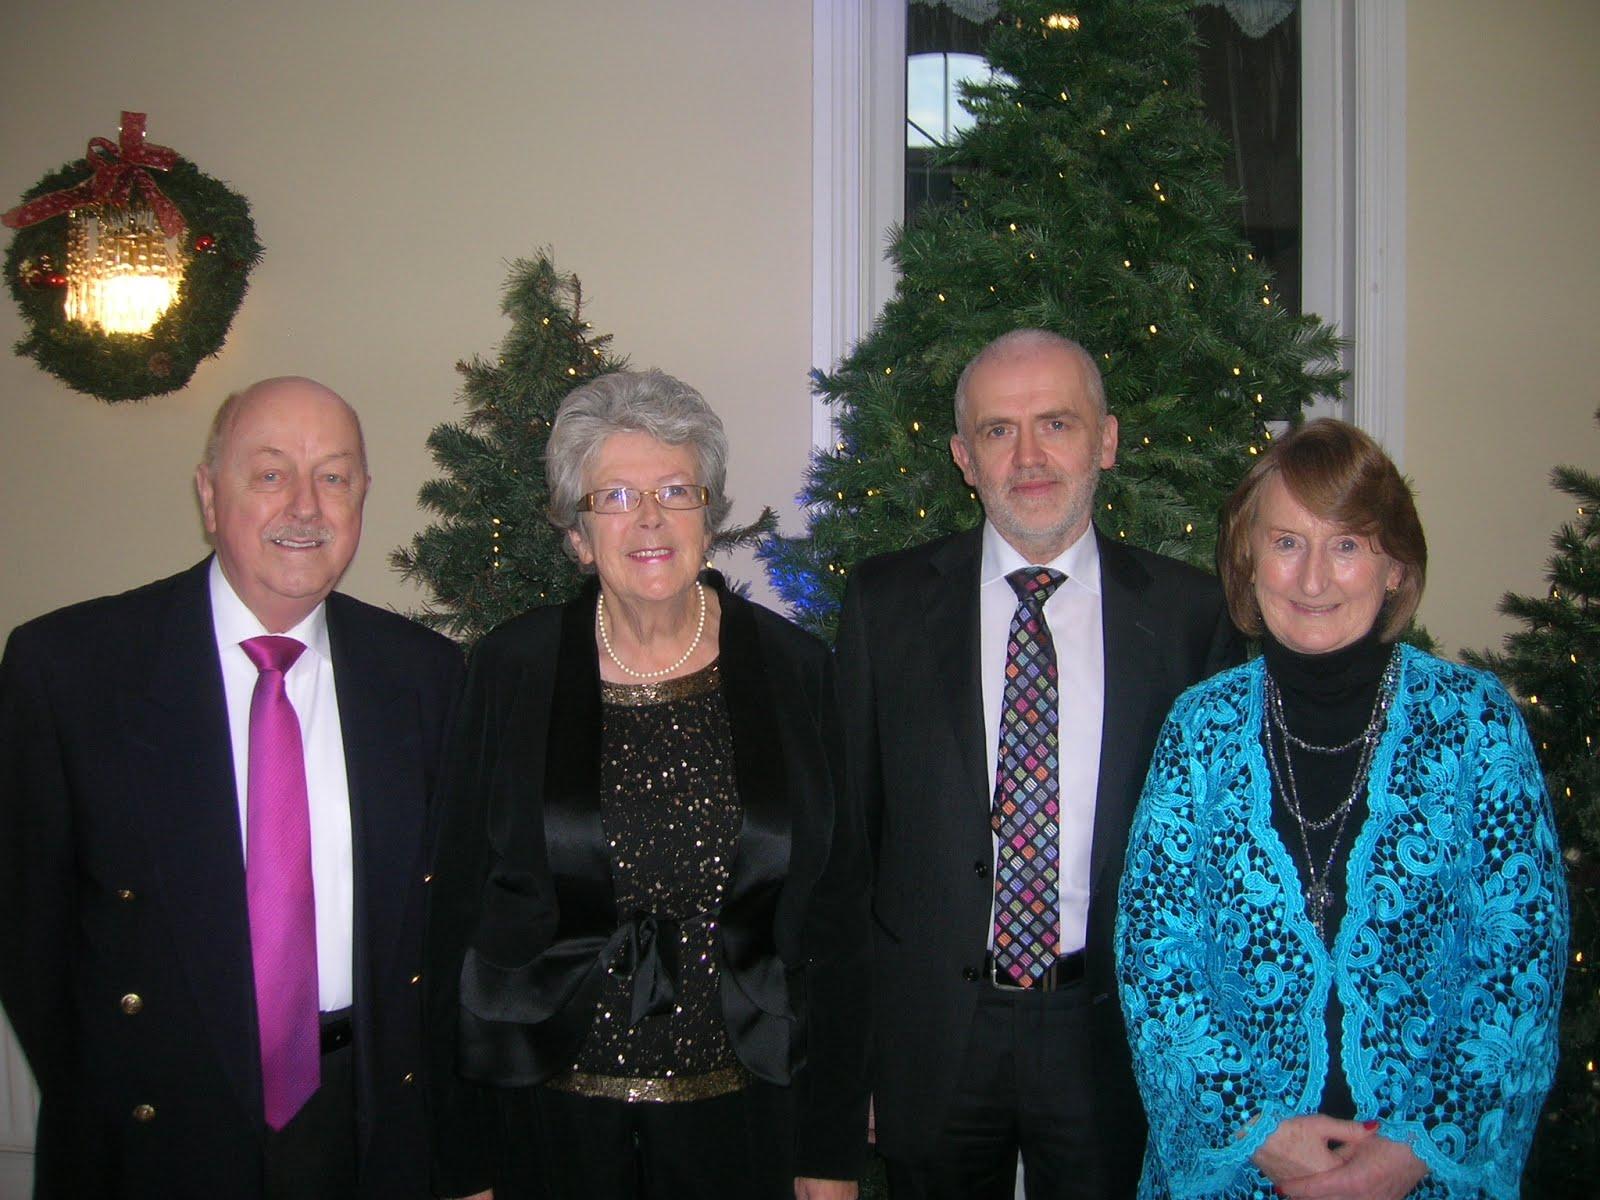 Denis, Mary, Billy and Mary Howley